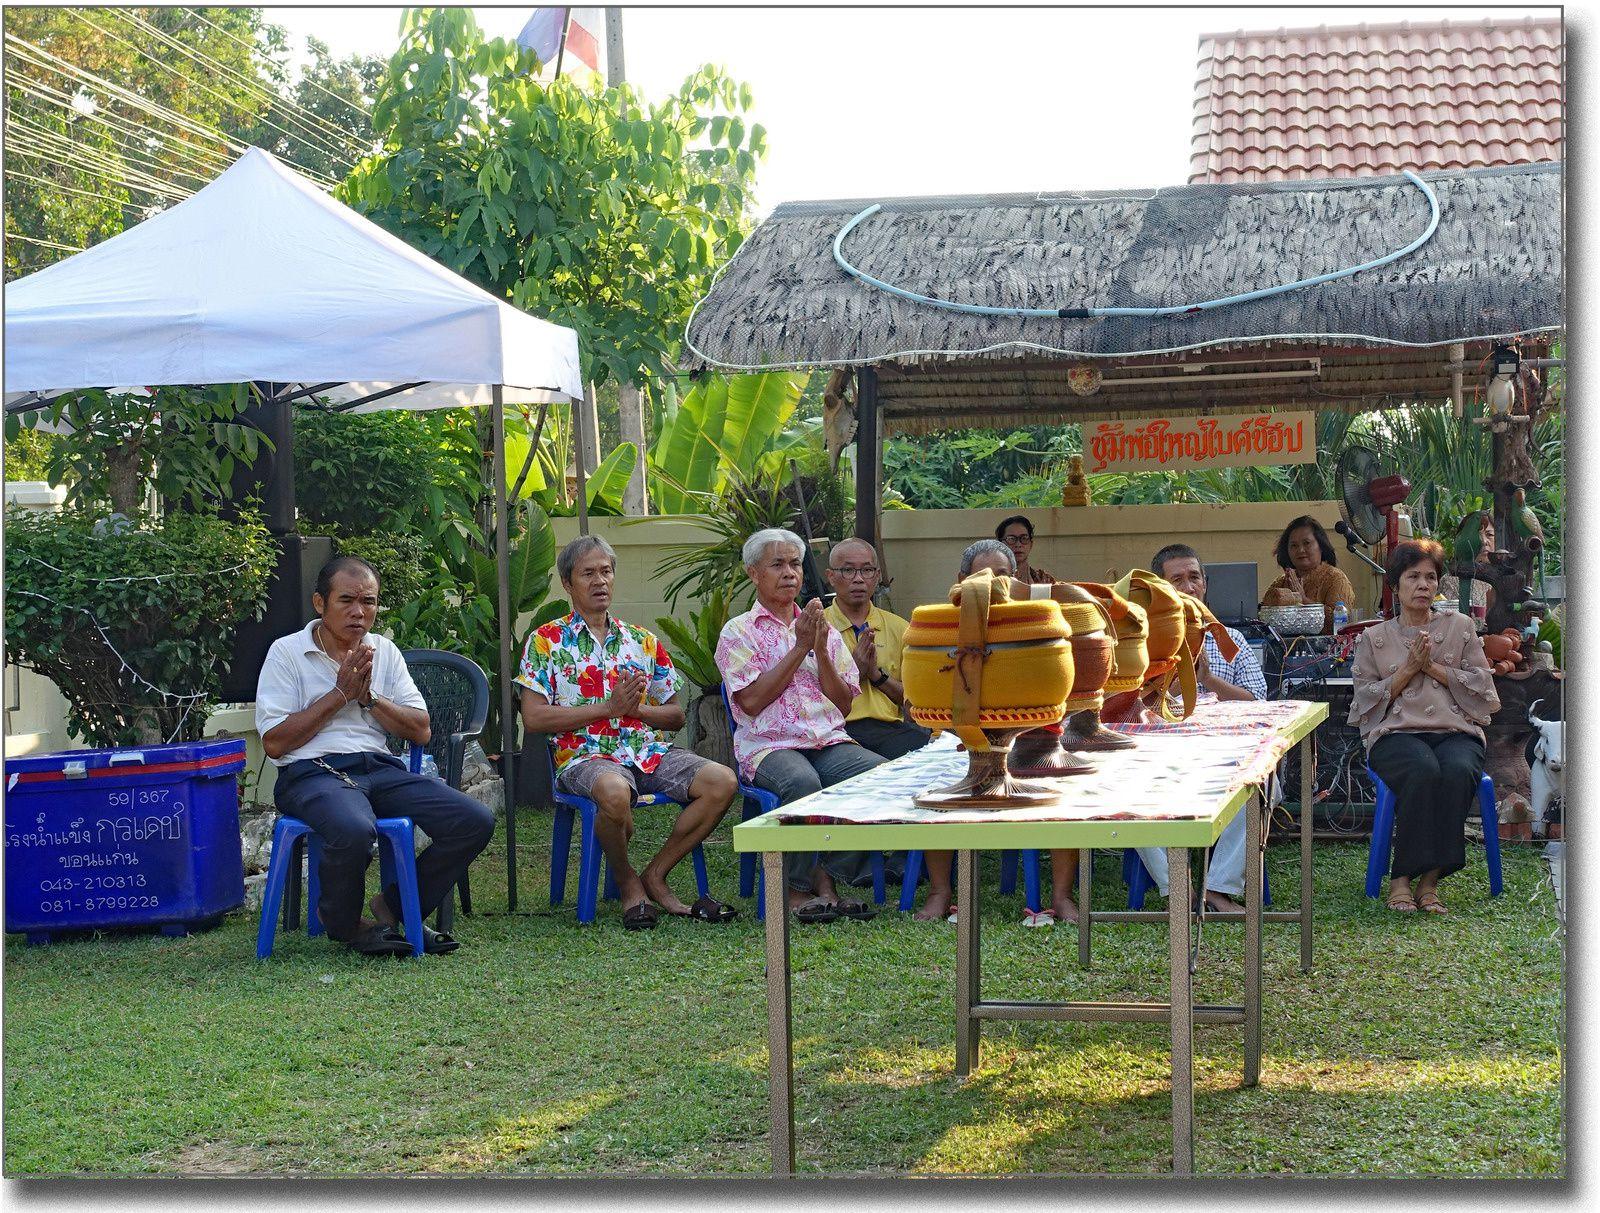 L'anniversaire de notre voisin Samroeng (Thaïlande)